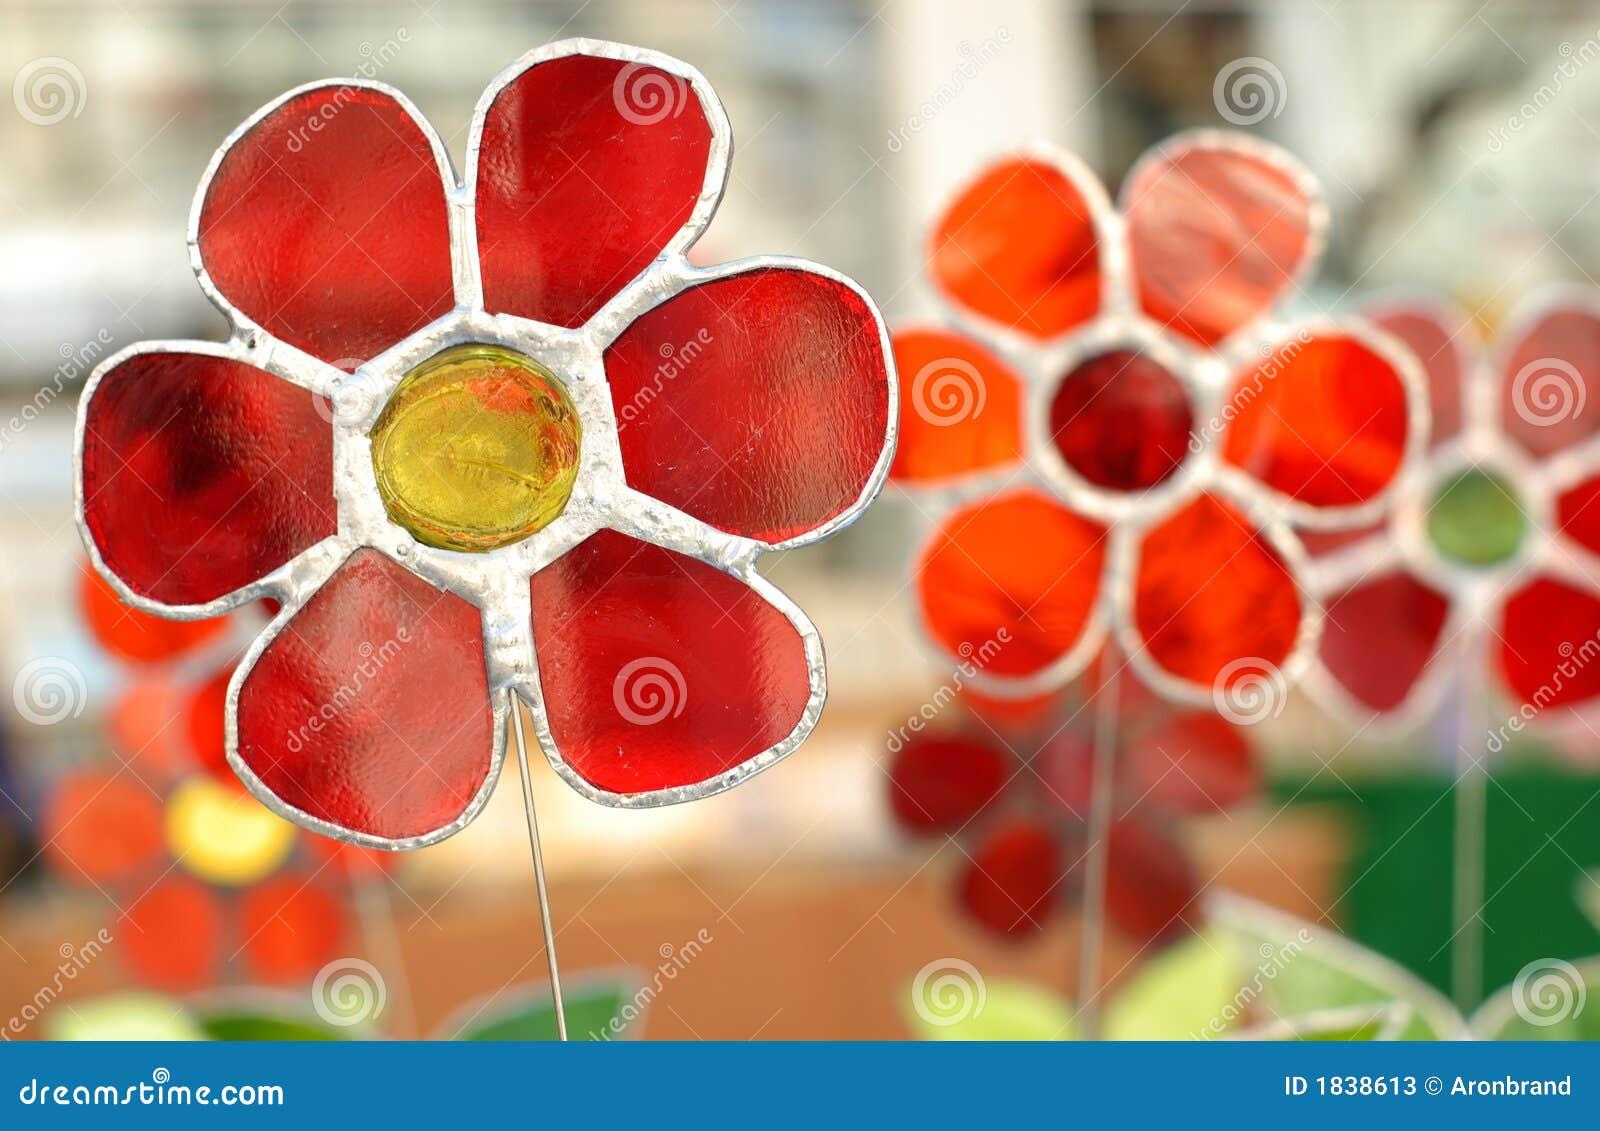 decoration decorative flowers glass - Decorative Glass